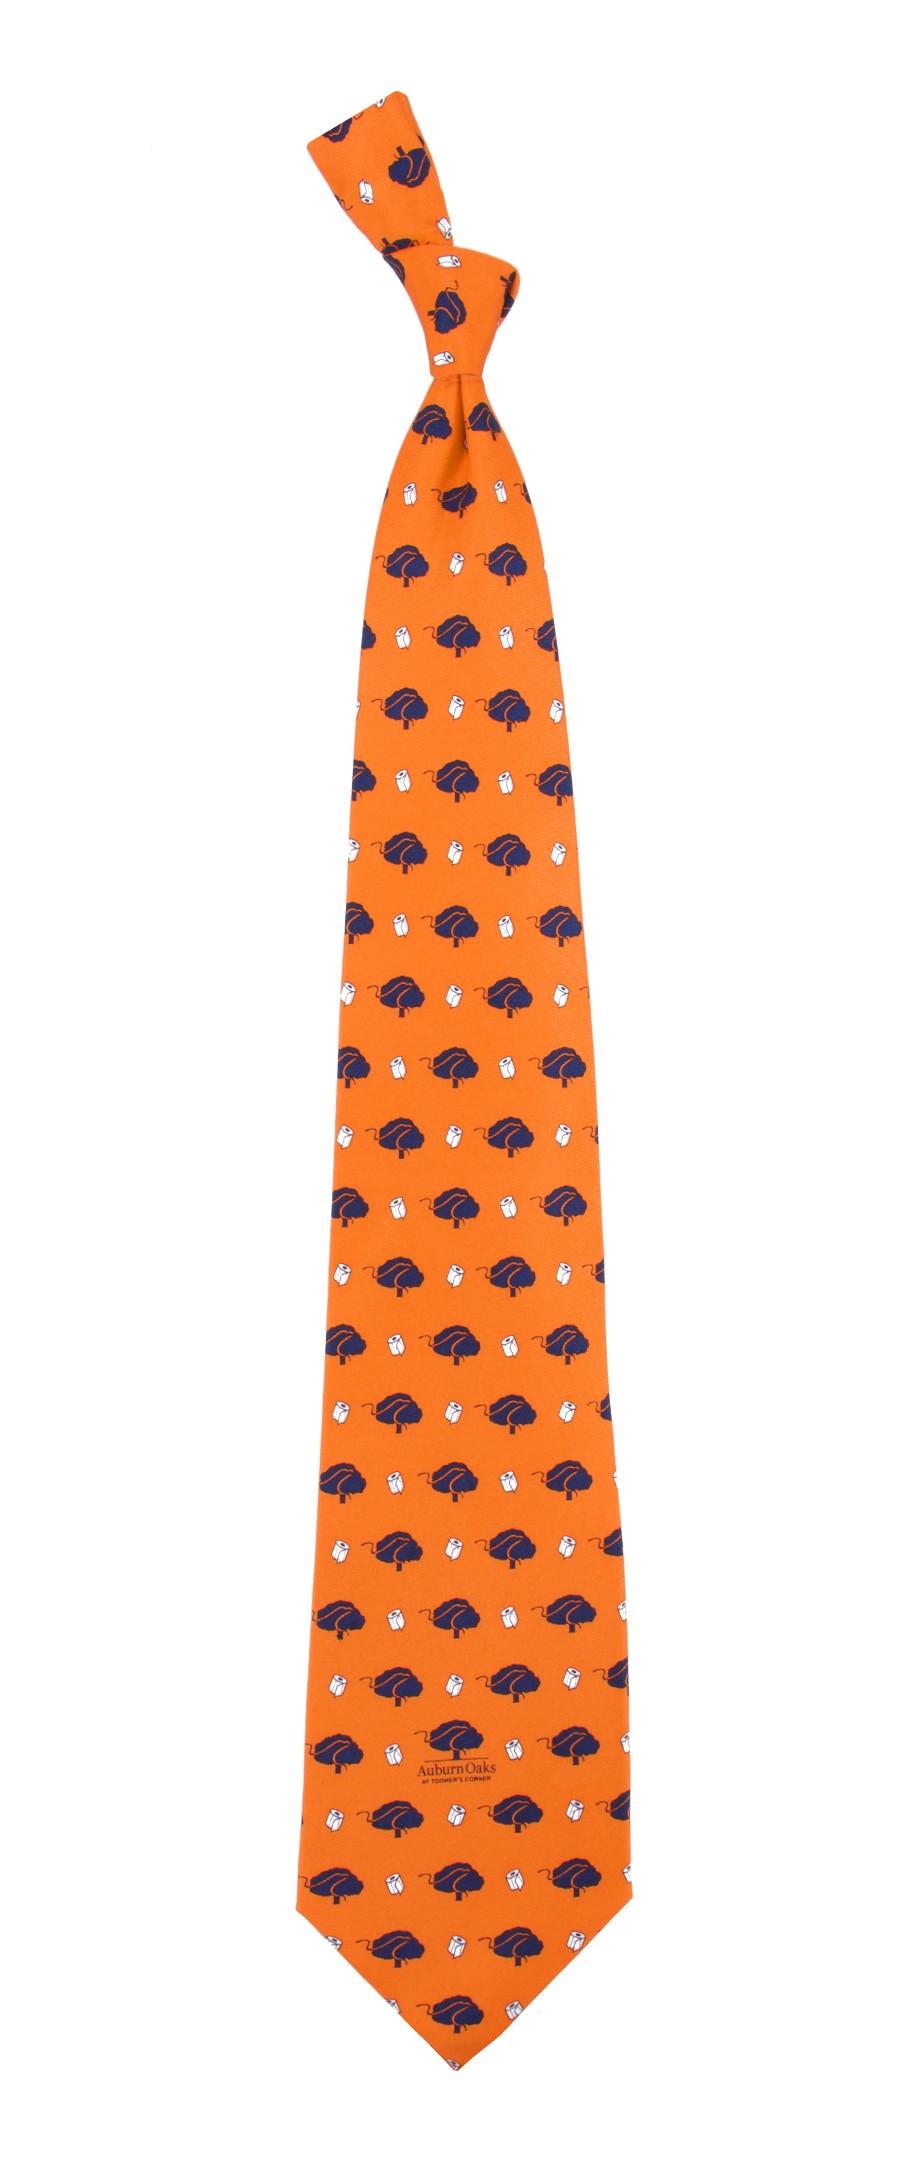 Orange clipart necktie Necktie Oaks Auburn Orange Oaks